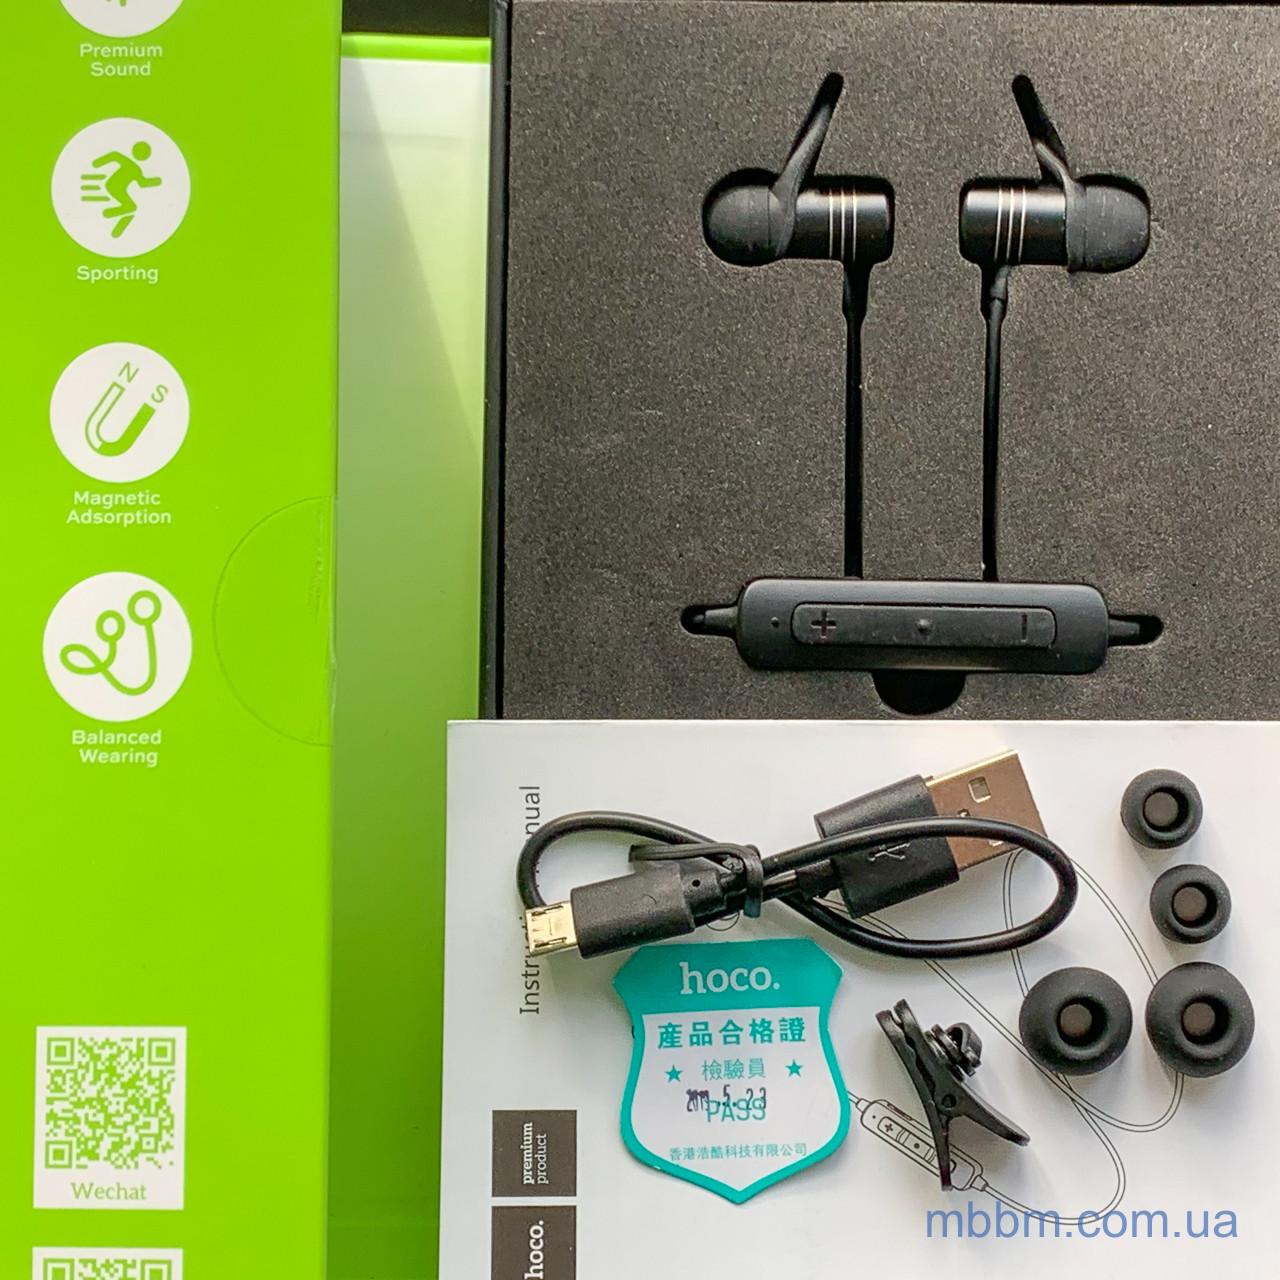 bluetooth Hoco ES14 Plus Breathing Sound Sports Вкладыши Силикон Гарнитура Bluetooth Черный AVRCP Hands-free Headset Внутри ушной раковины